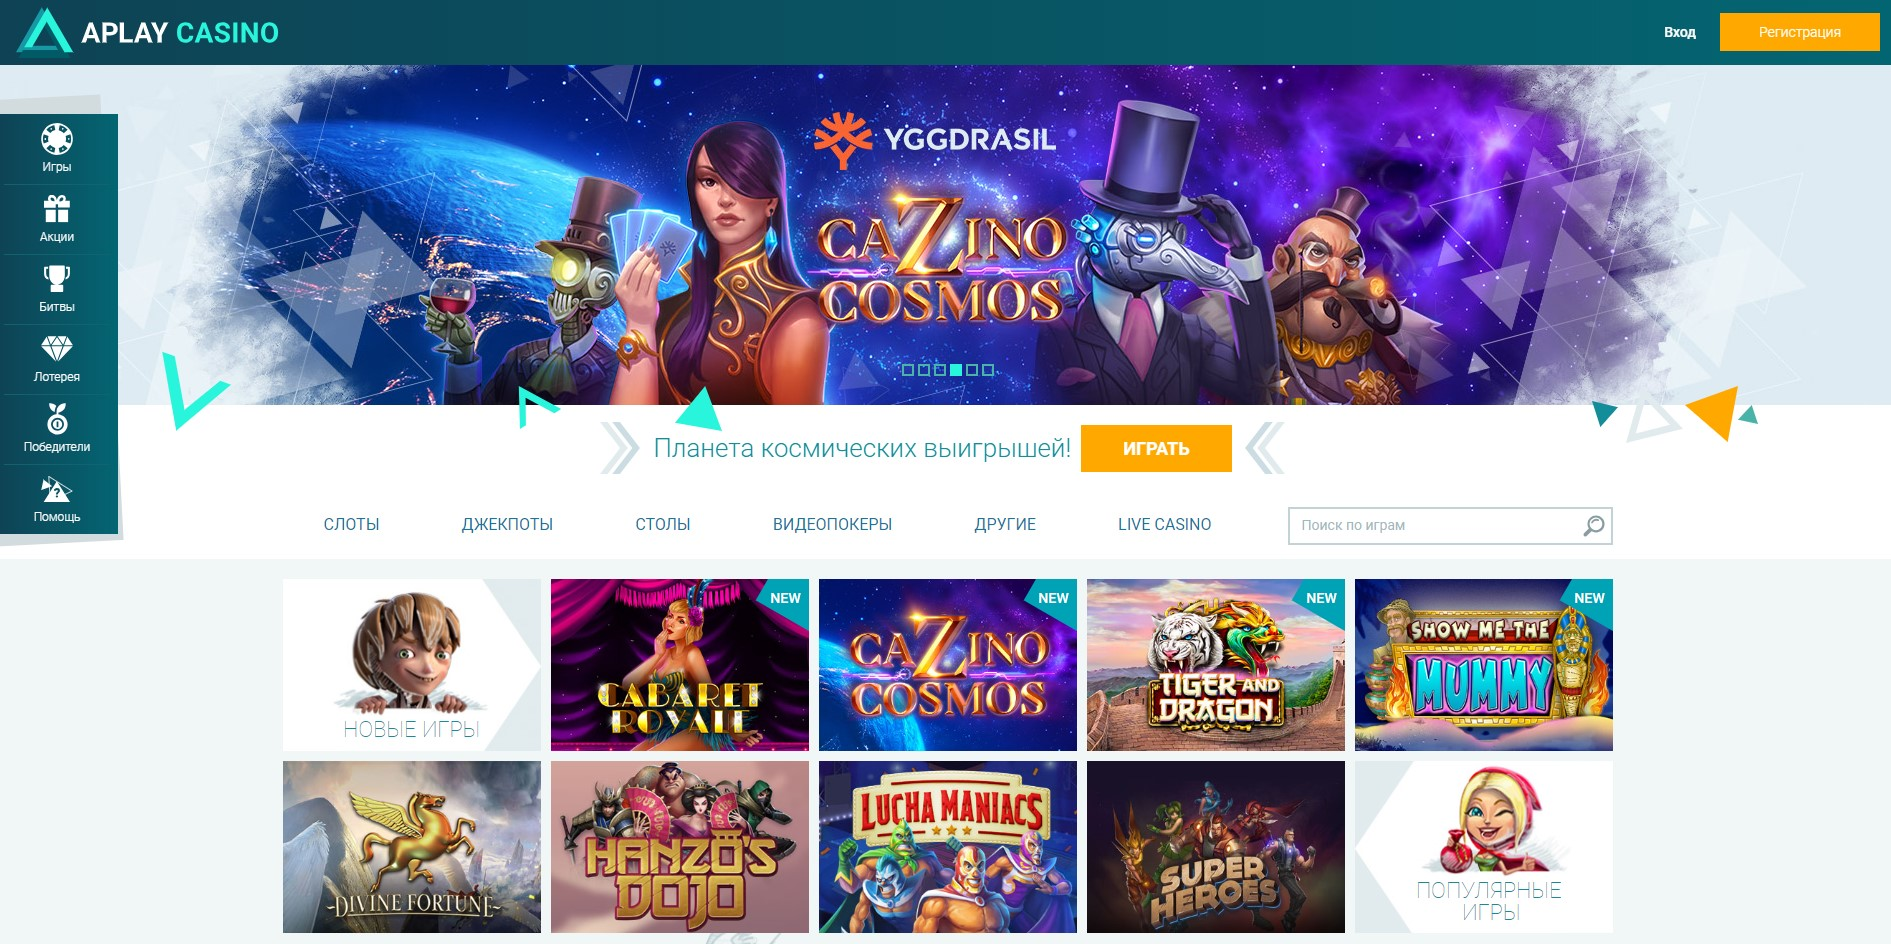 Онлайн-казино Aplay Casino